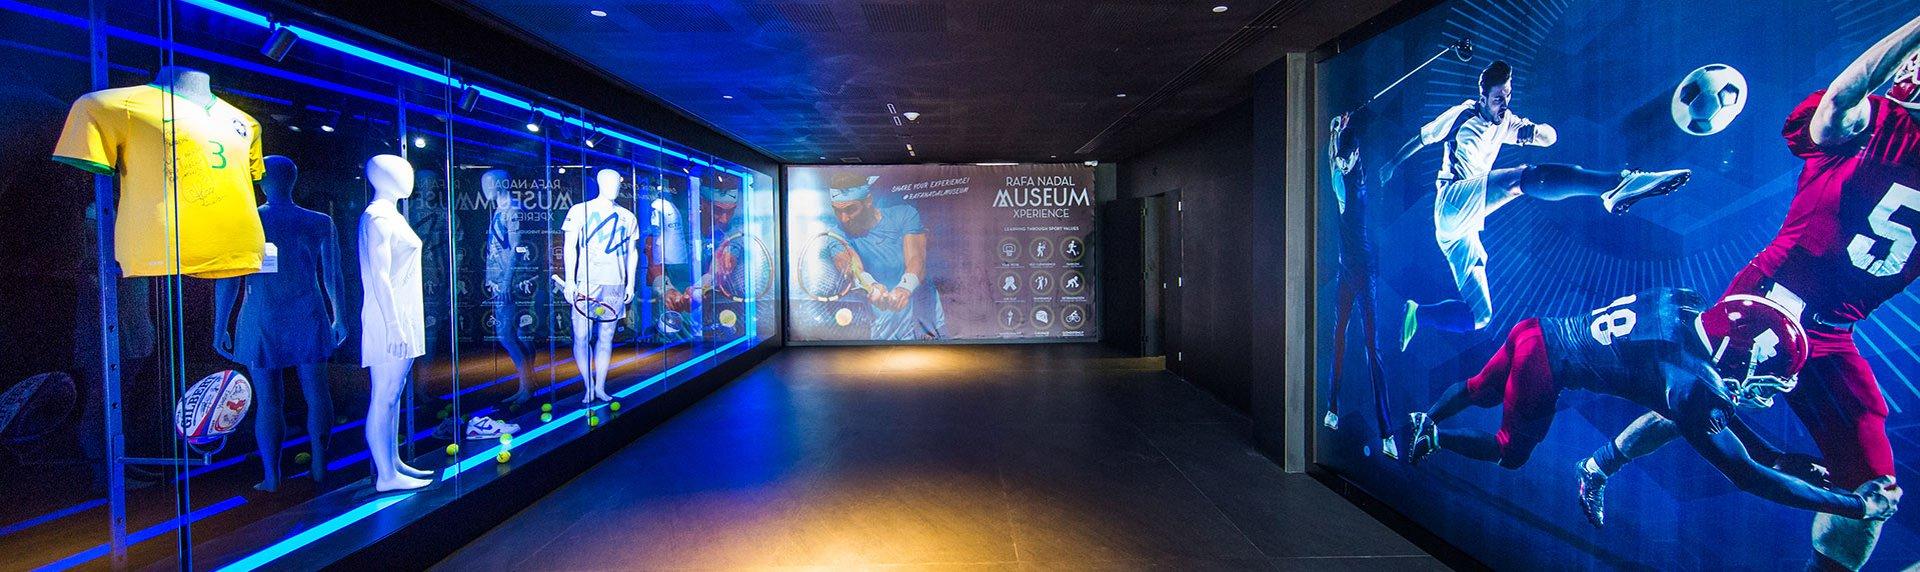 RAFA NADAL MUSEUM XPERIENCE | Rafa Nadal Tennis Centre